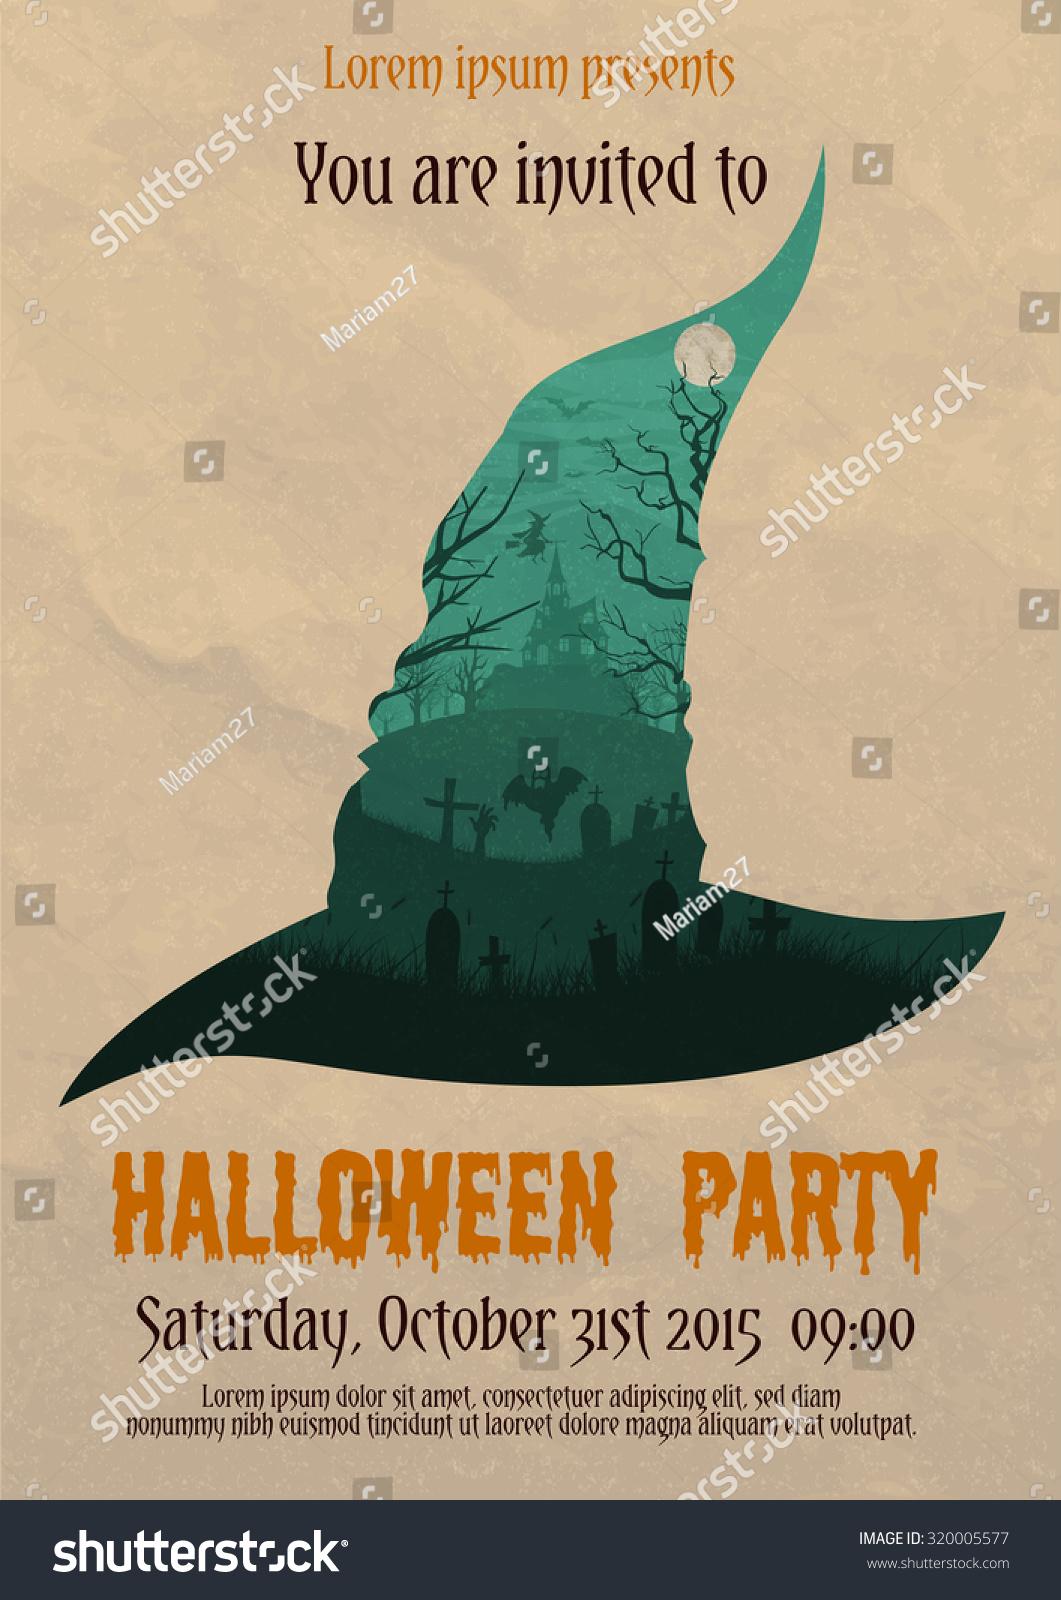 Vector Illustration Vintage Halloween Party Invitation Stock ...